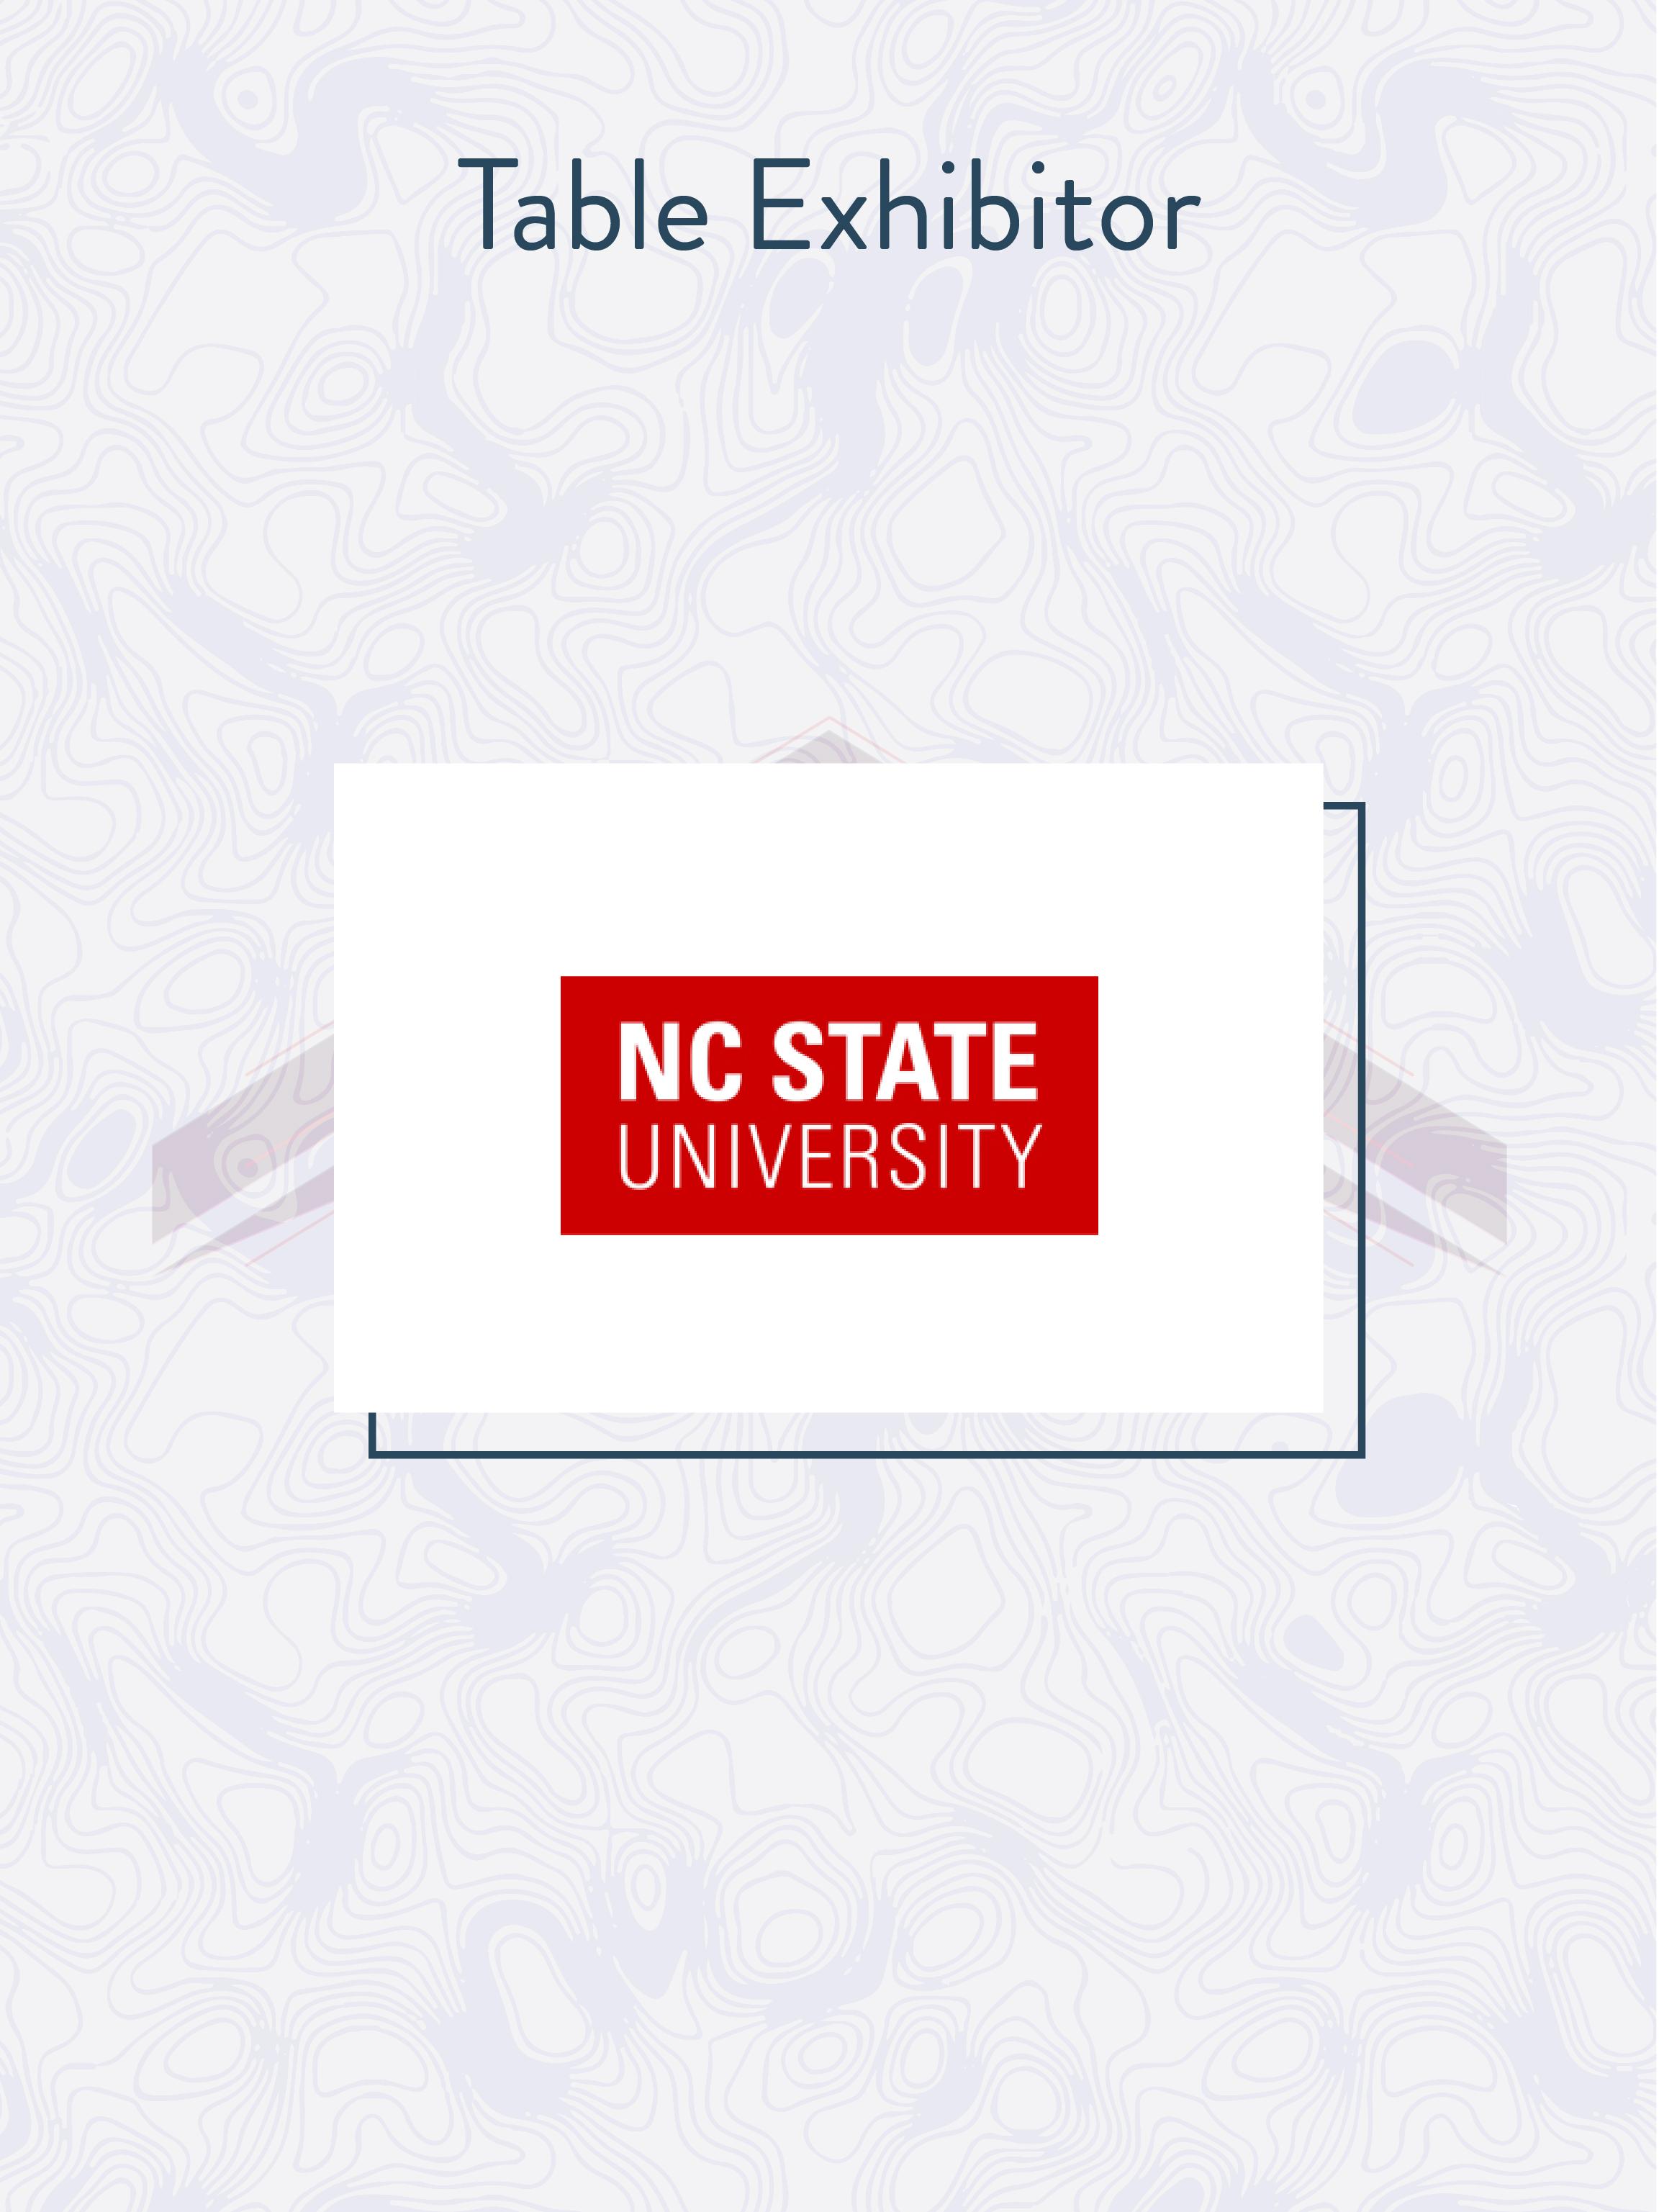 NCSU.jpg